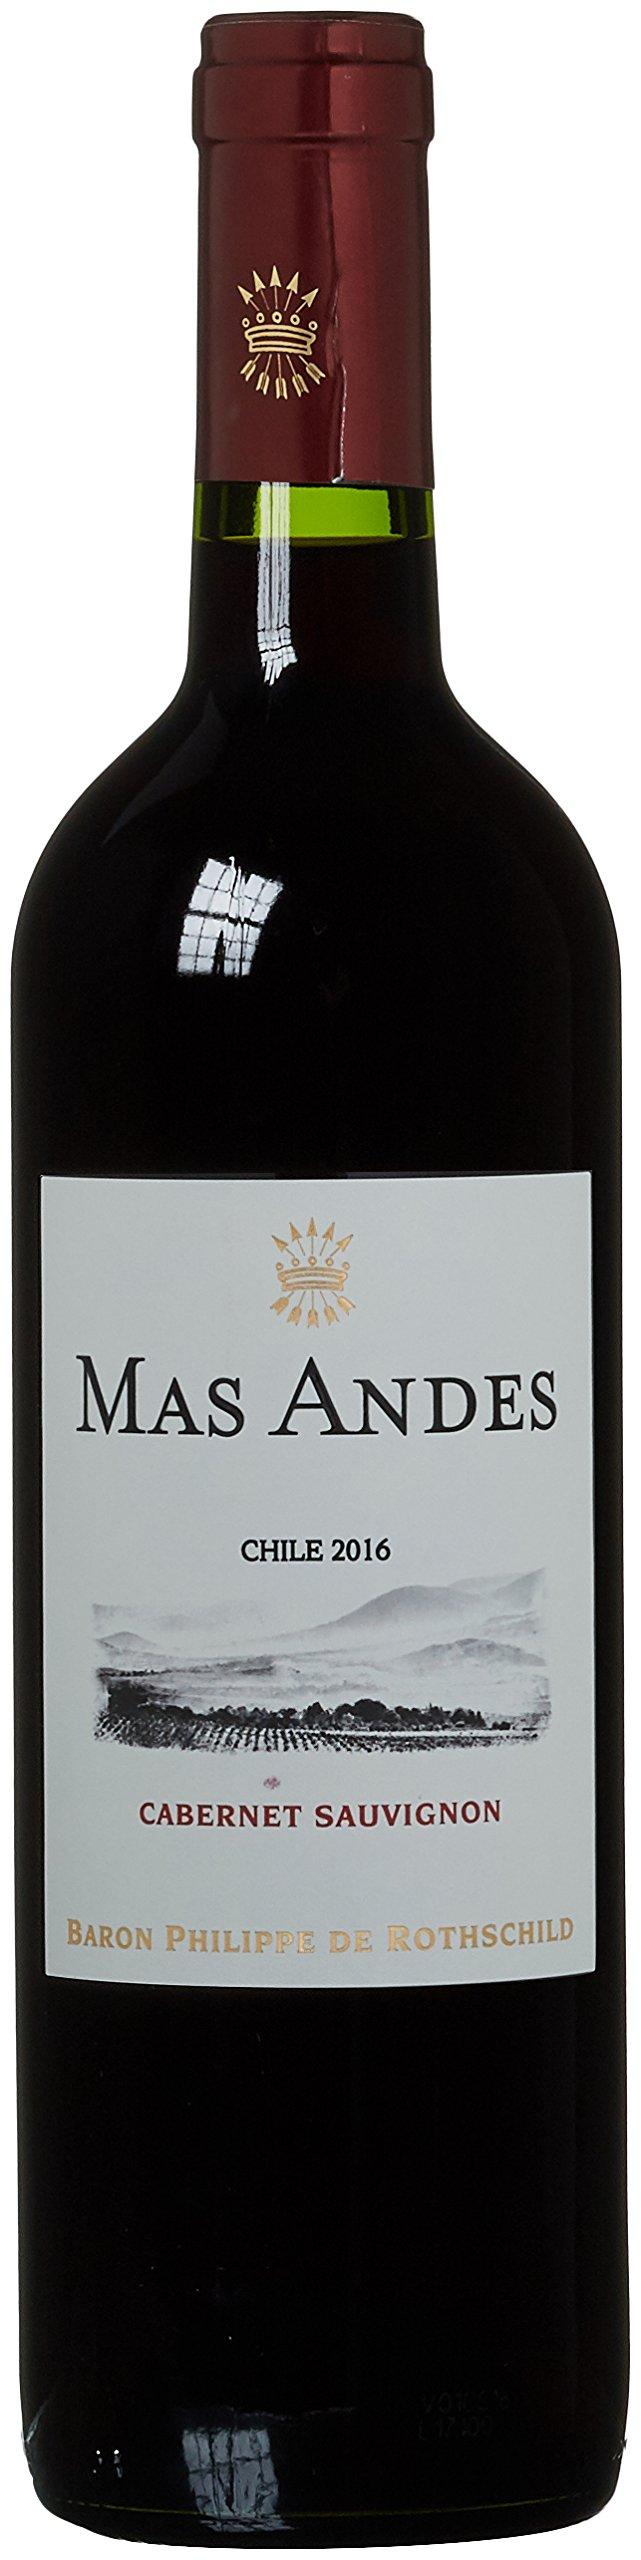 Mas-Andes-Cabernet-Sauvignon-Chile-trocken-6-x-075-l